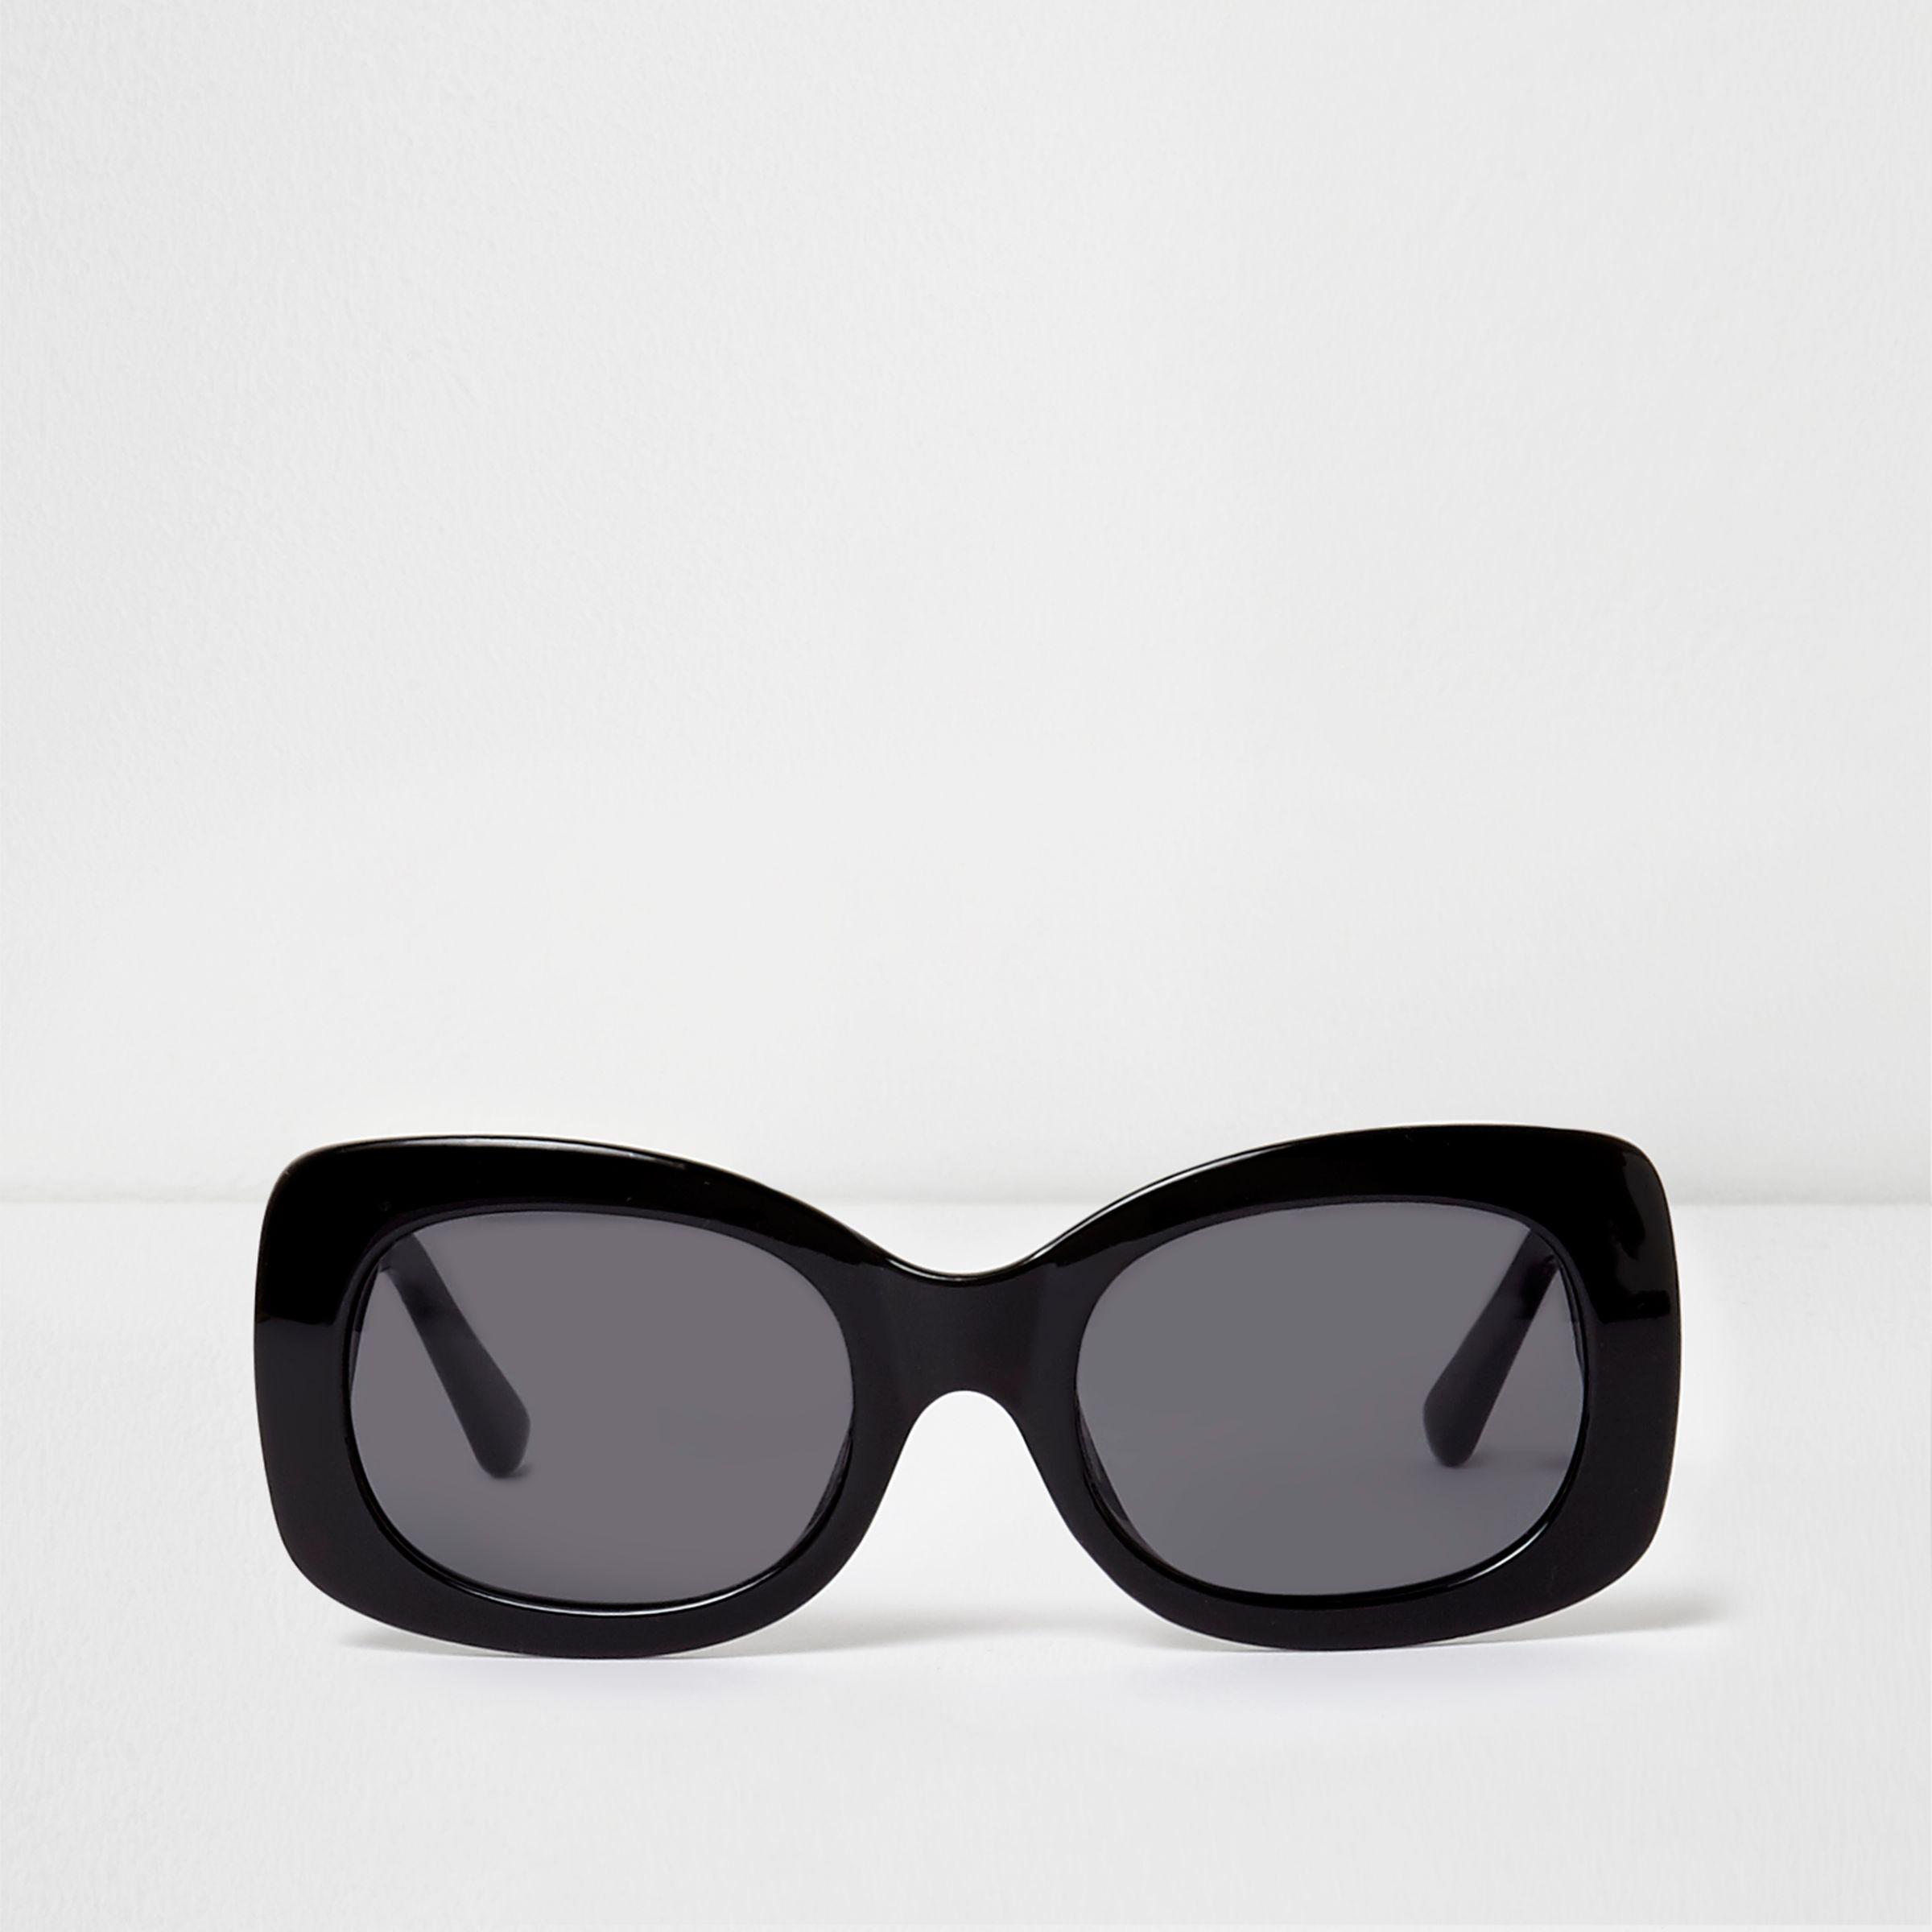 60f27242698 River Island Black Square Frame Glam Sunglasses in Black - Lyst